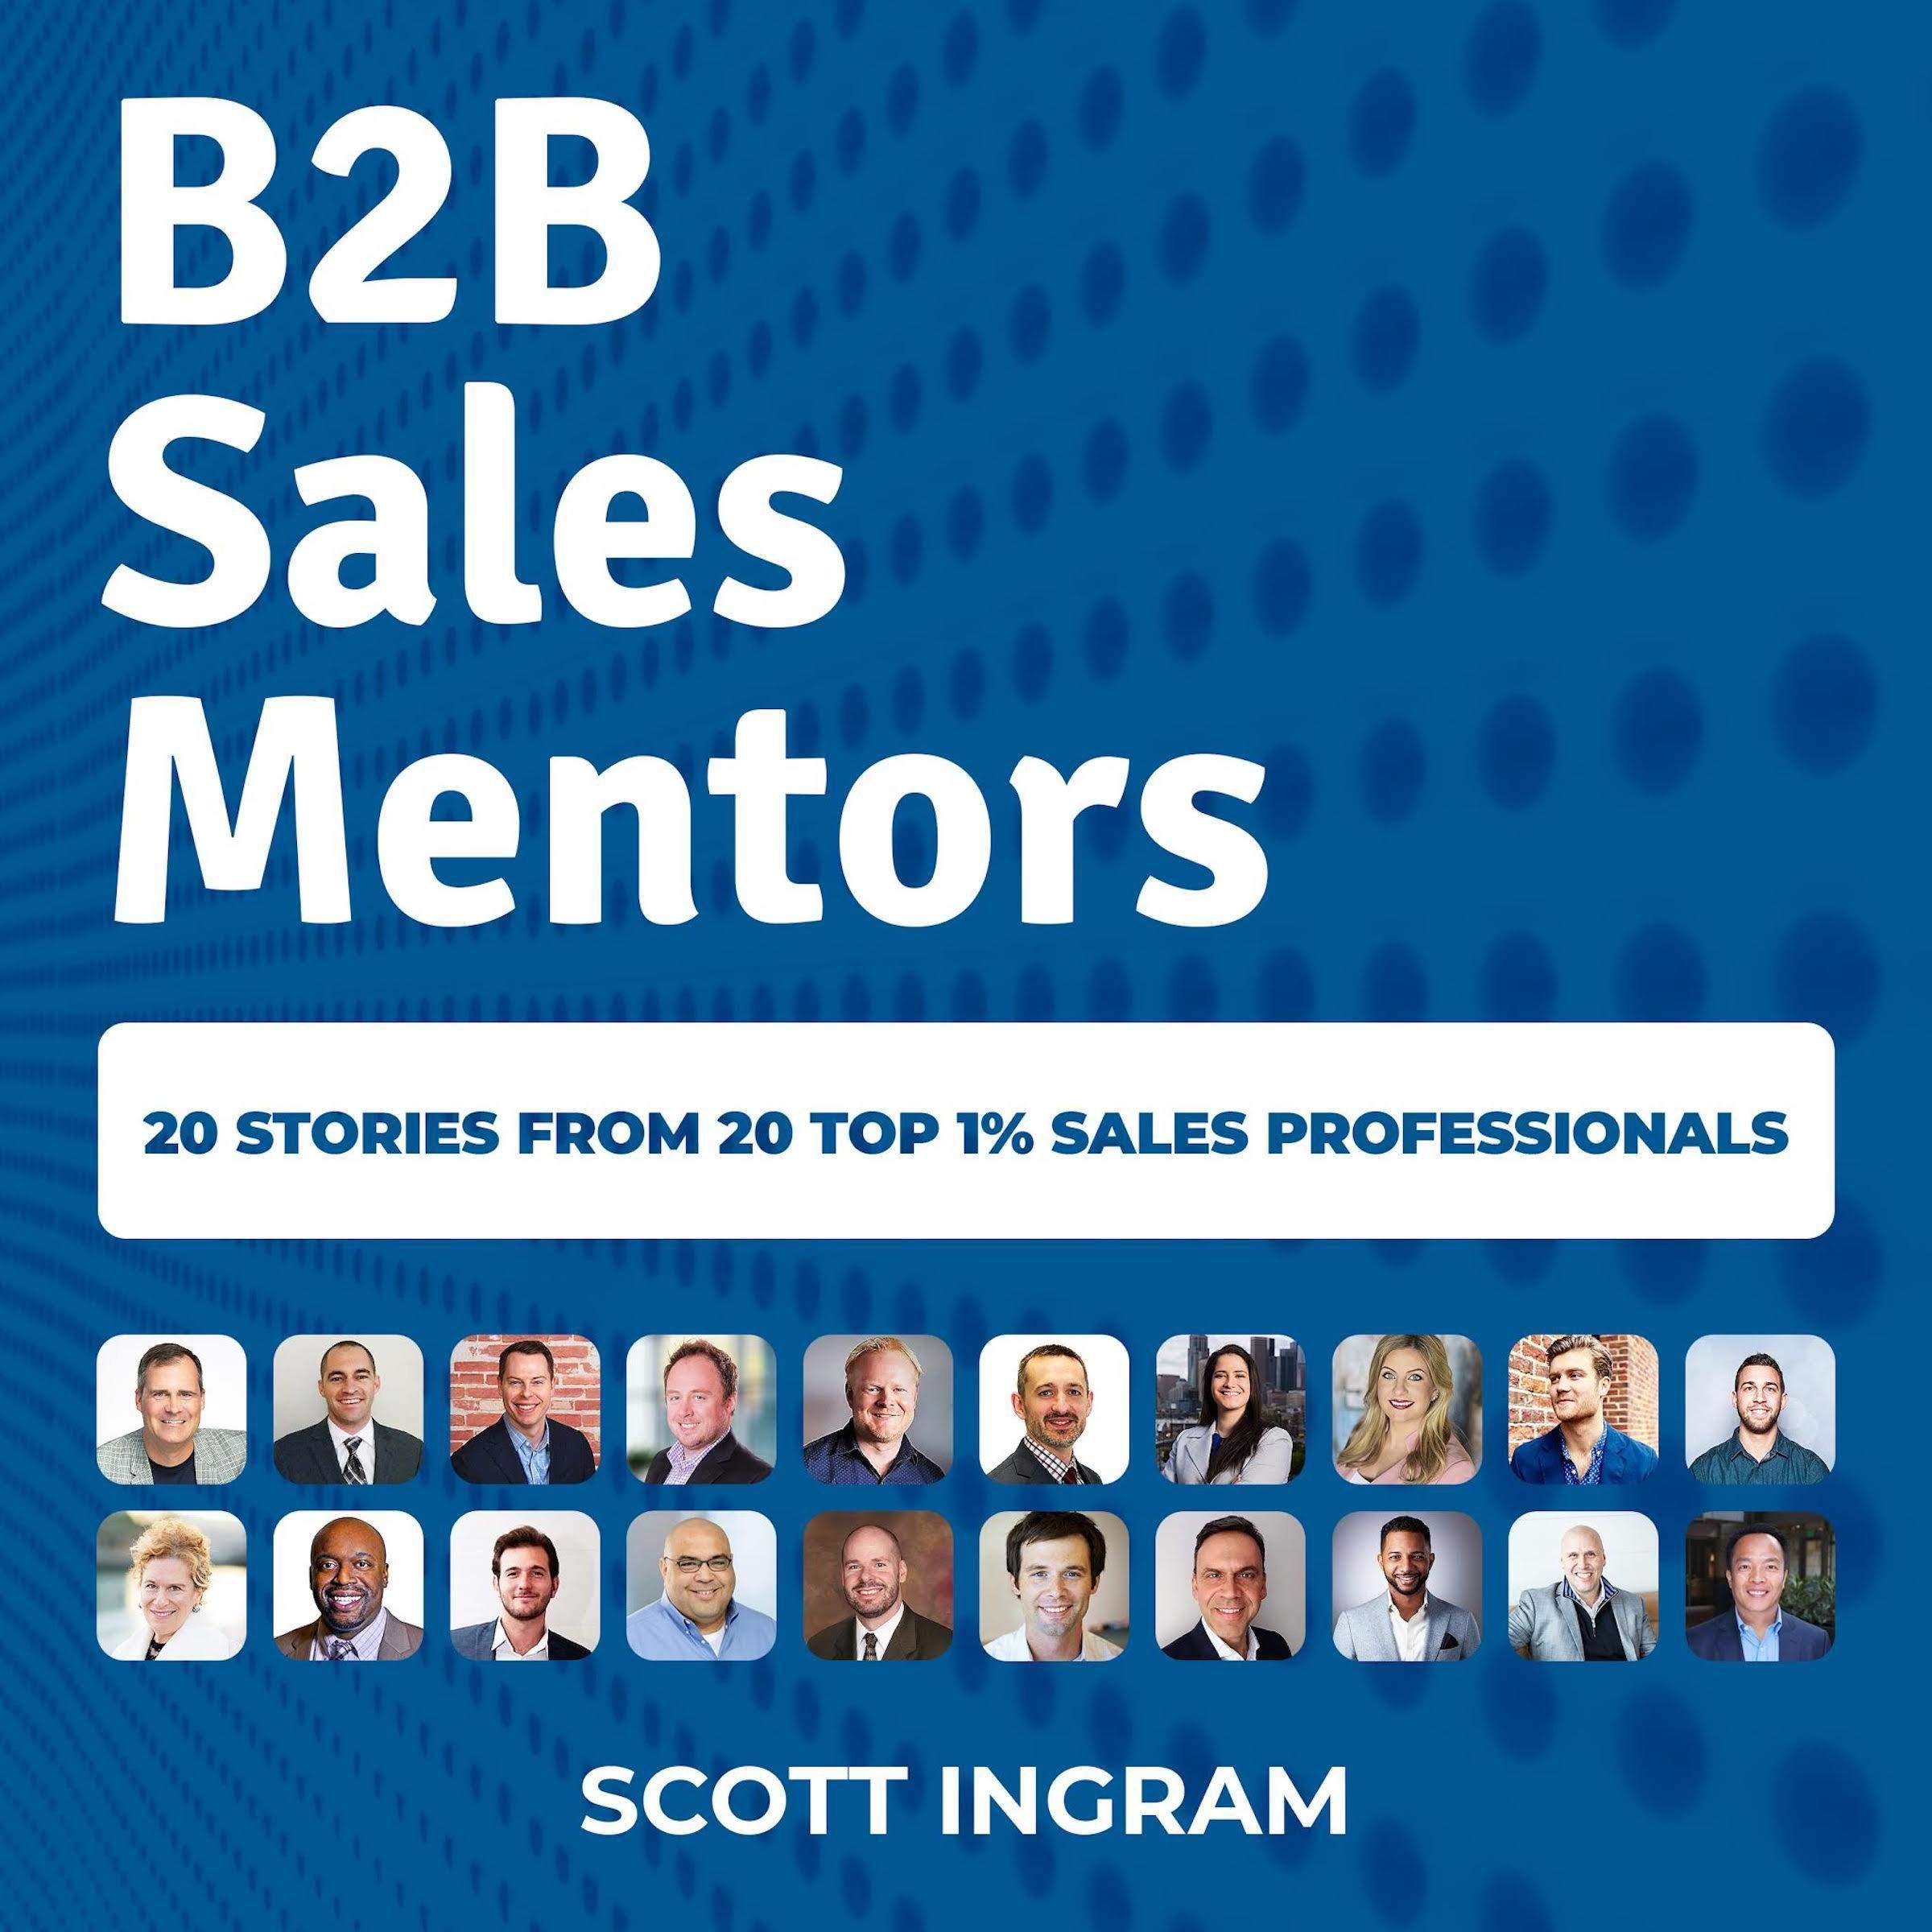 B2B Sales Mentors  20 Stories From 20 Top 1% Sales Professionals